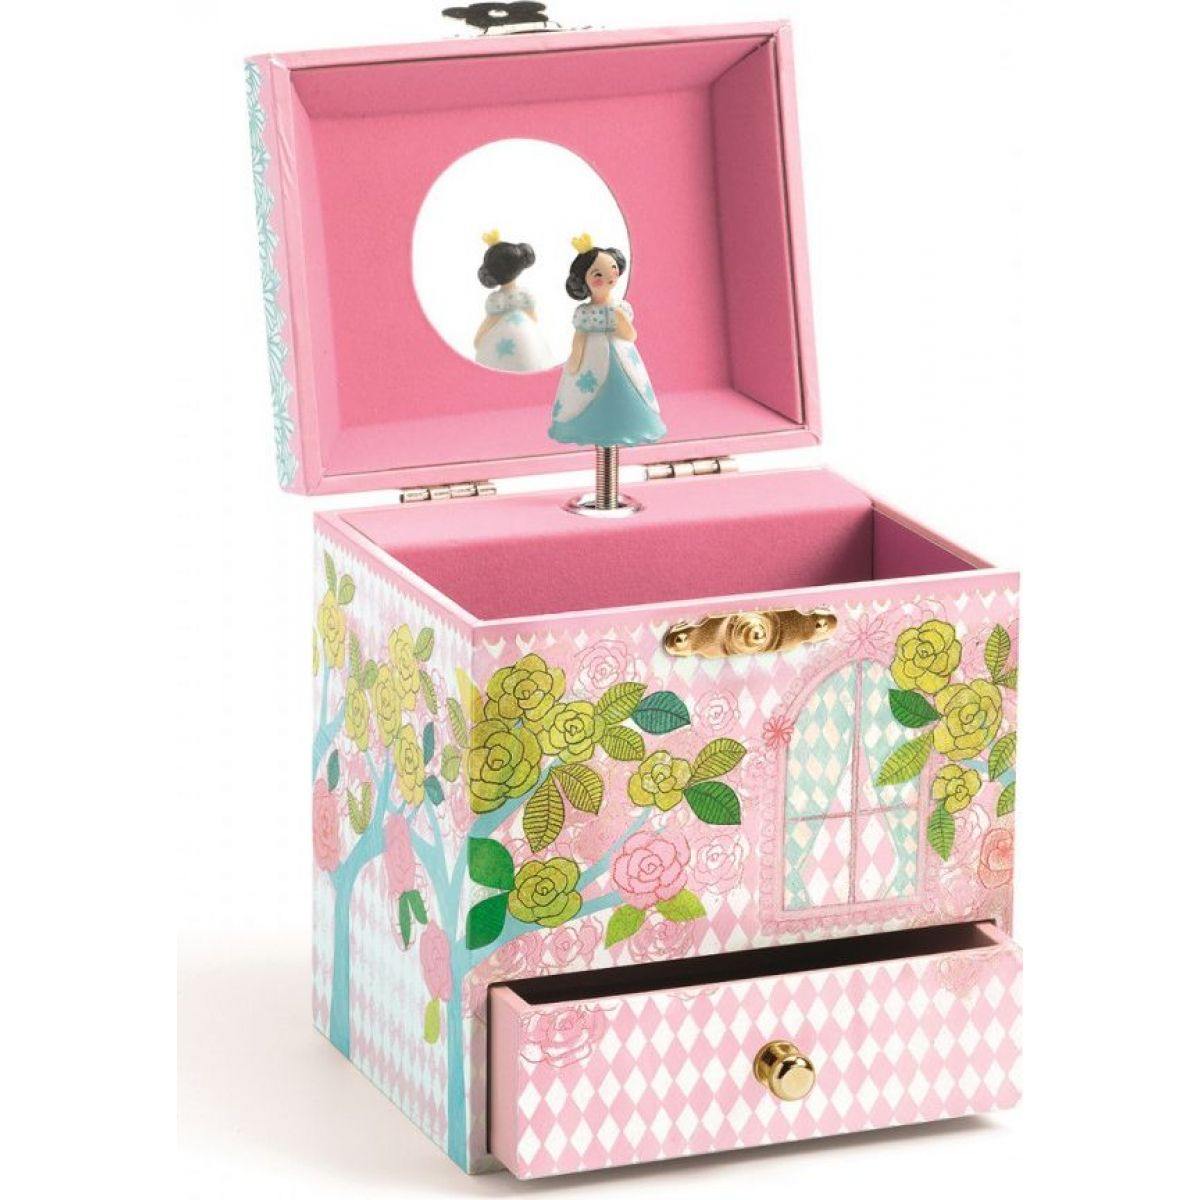 Djeco Hrací skříňka Princezna